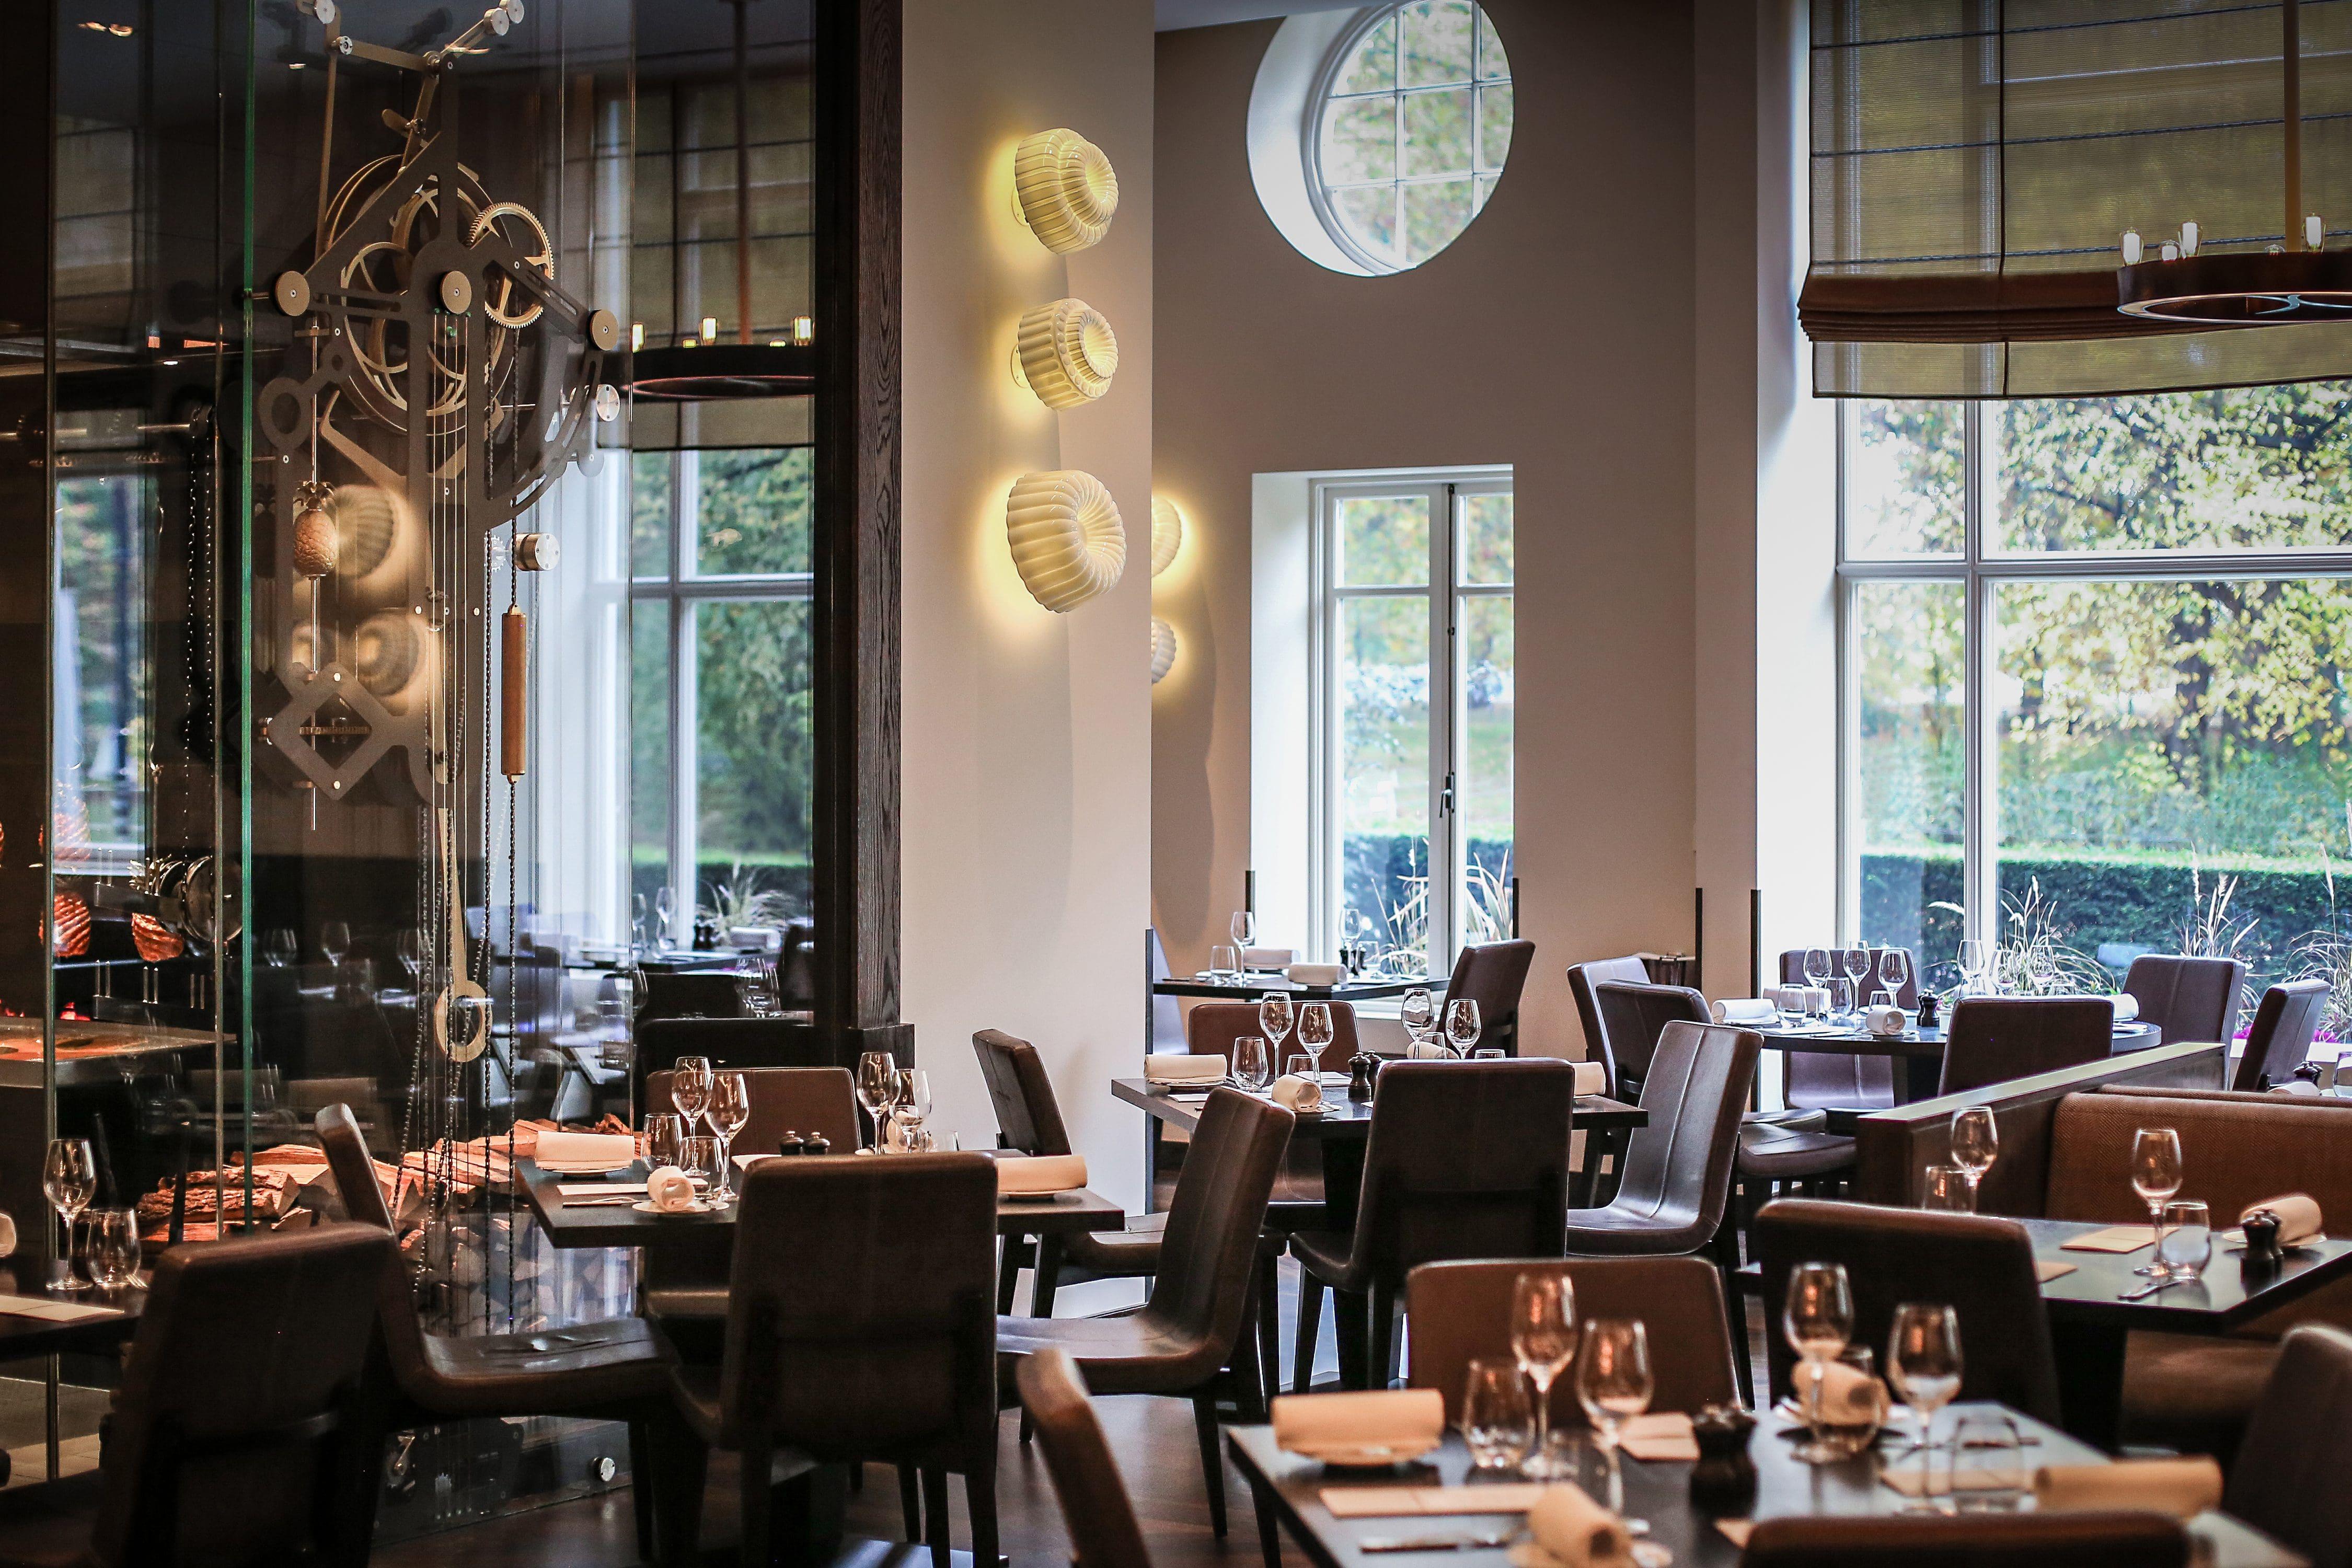 späte Restaurants London